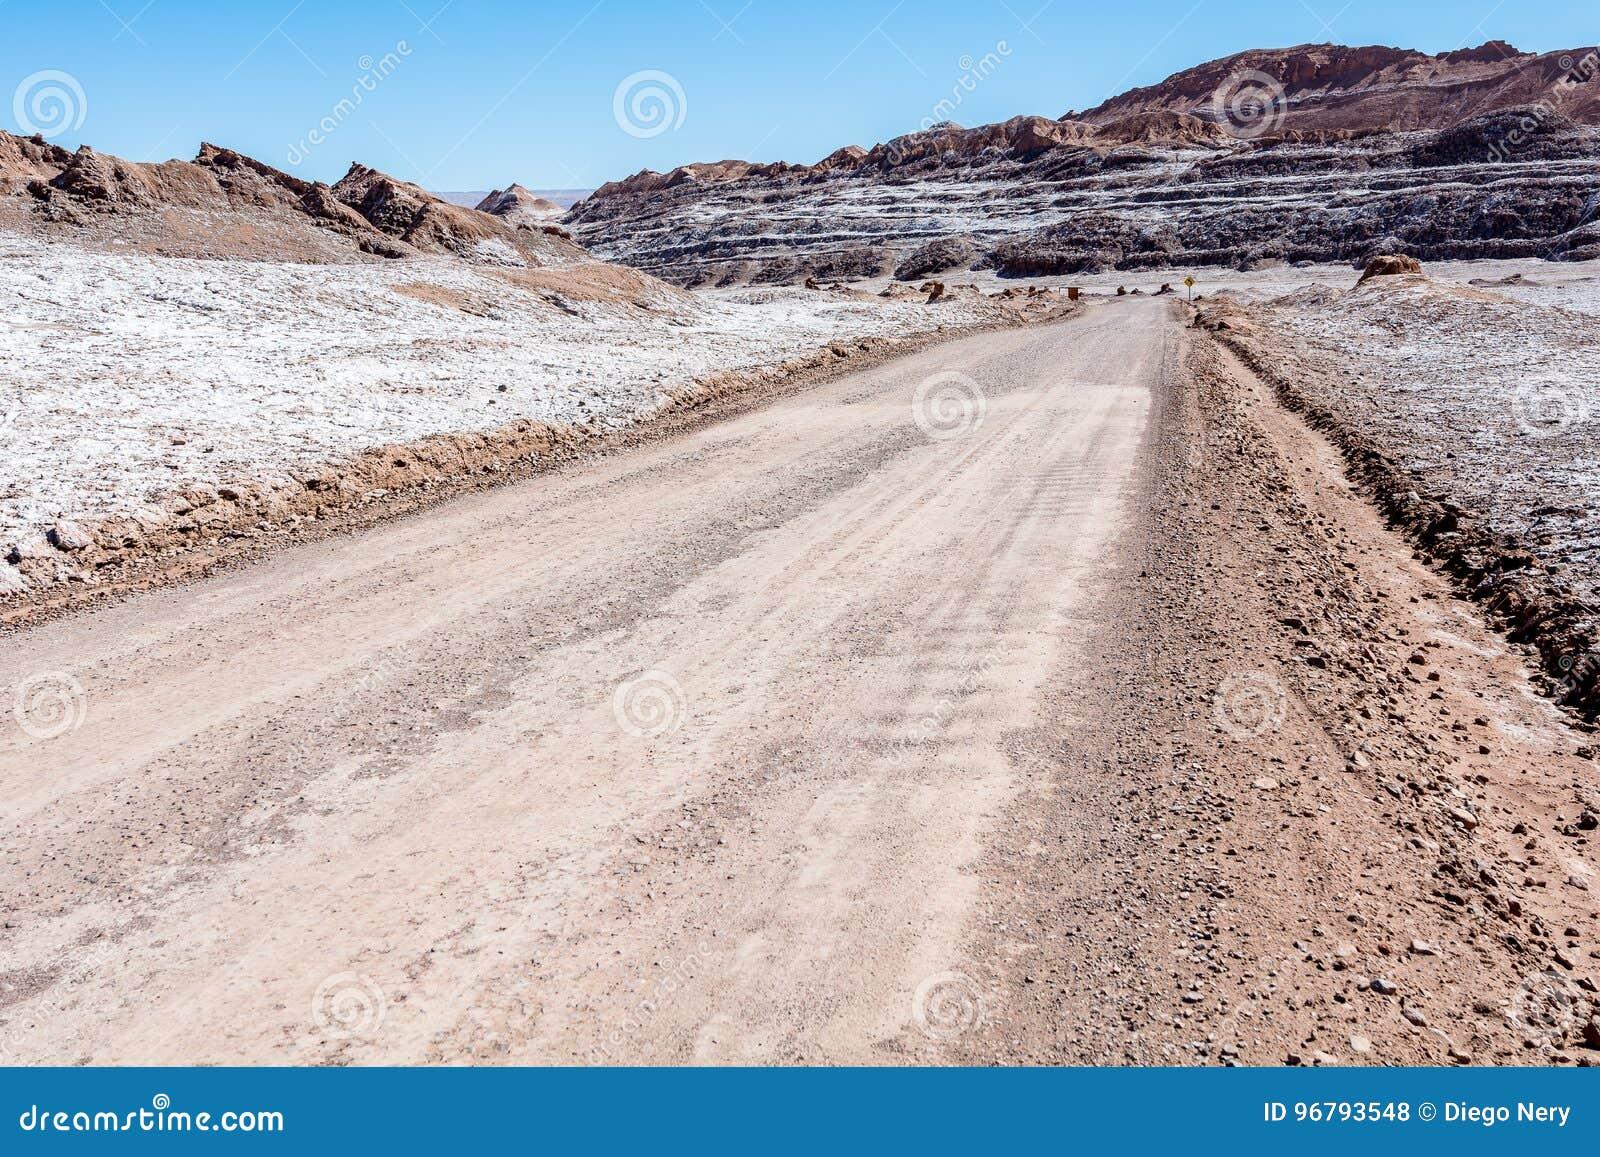 La Luna de Valle de - deserto de Atacama